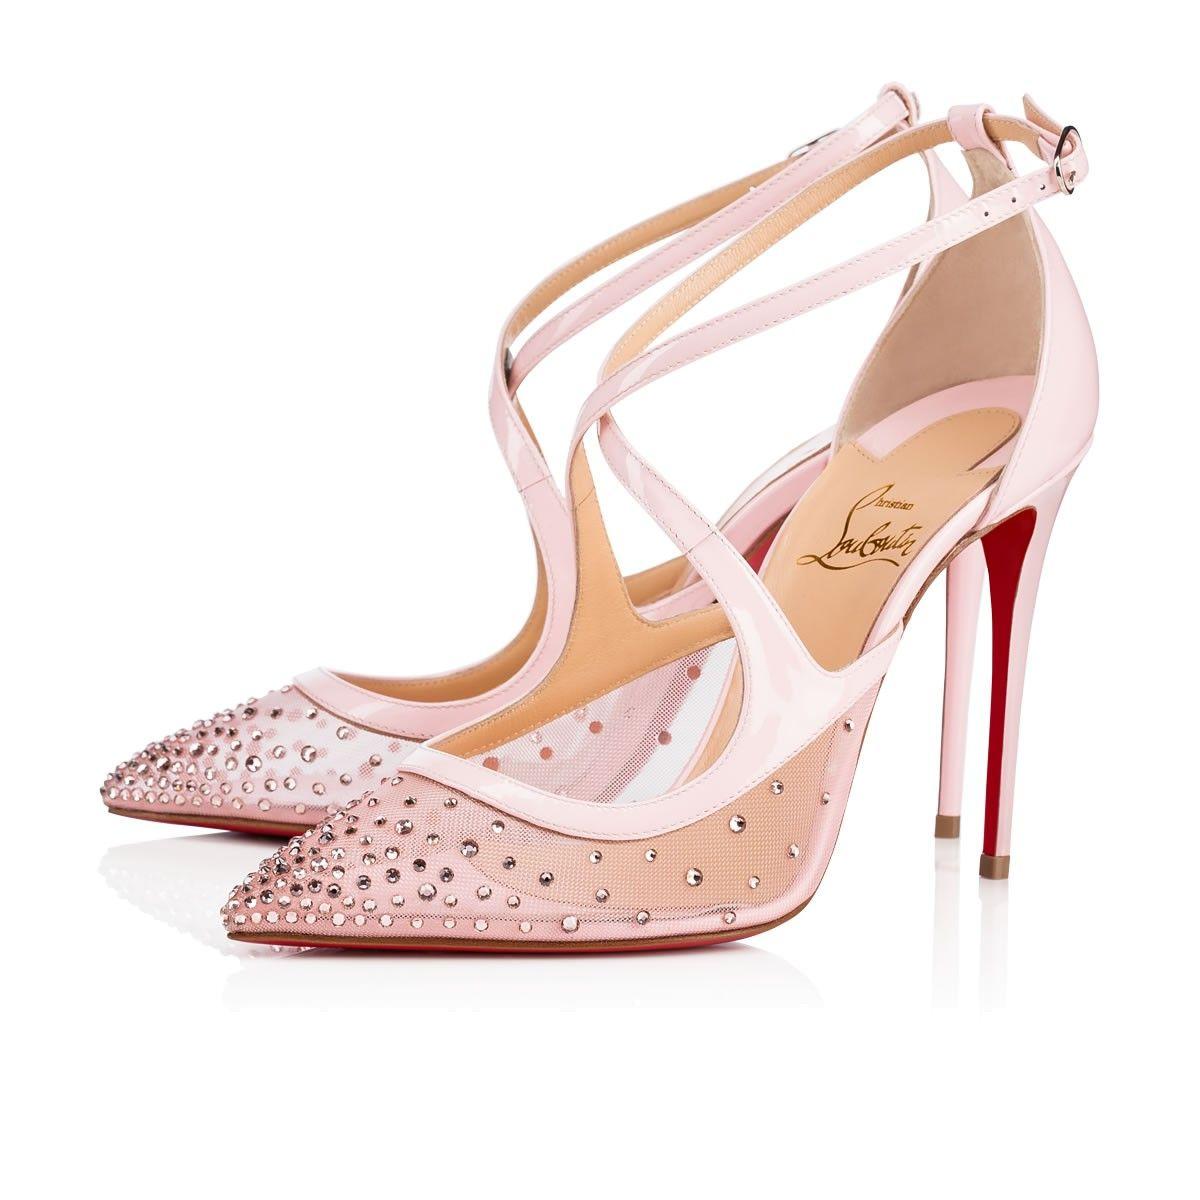 6d0cd53606d Twistissima Strass 100 Version Vintage Rose Strass - Women Shoes ...